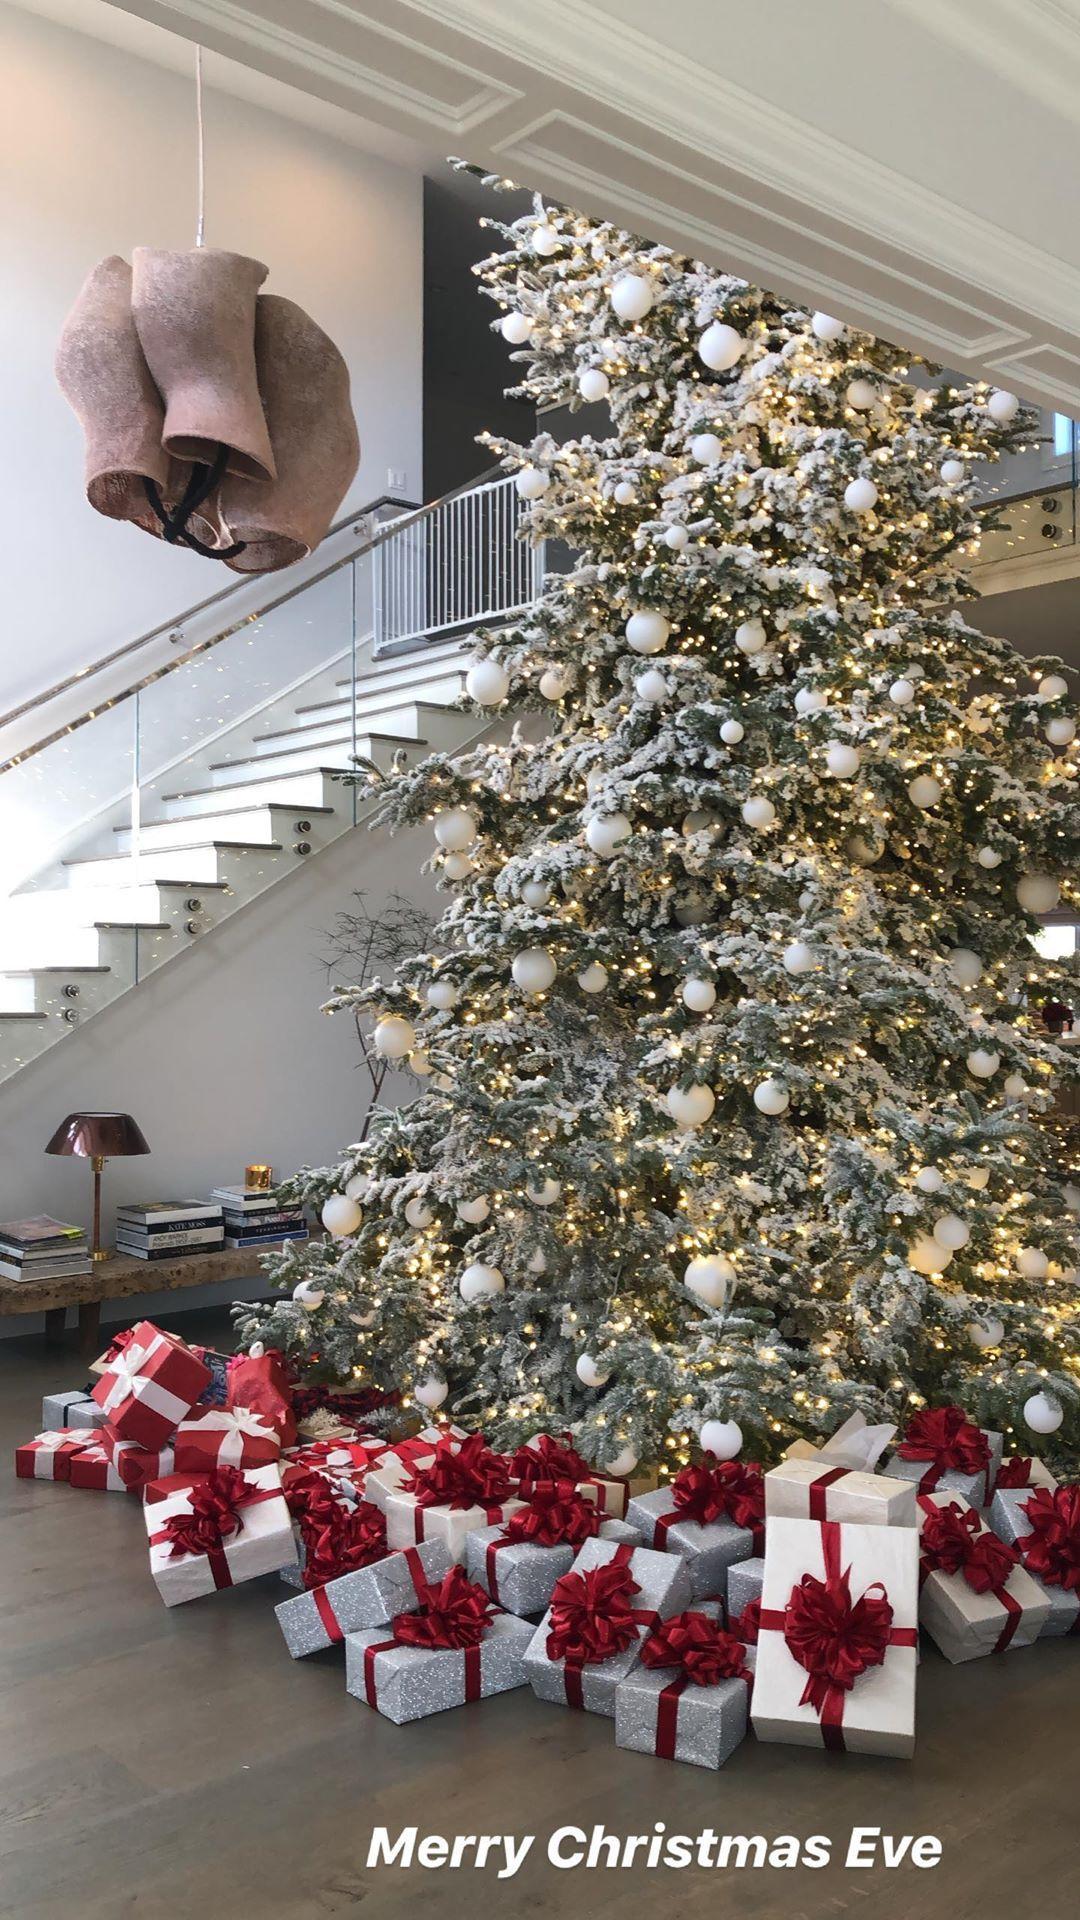 Kylie Jenner 2020 Christmas Photos Kylie Jenner's Christmas Tree ! in 2020 | Christmas luxury